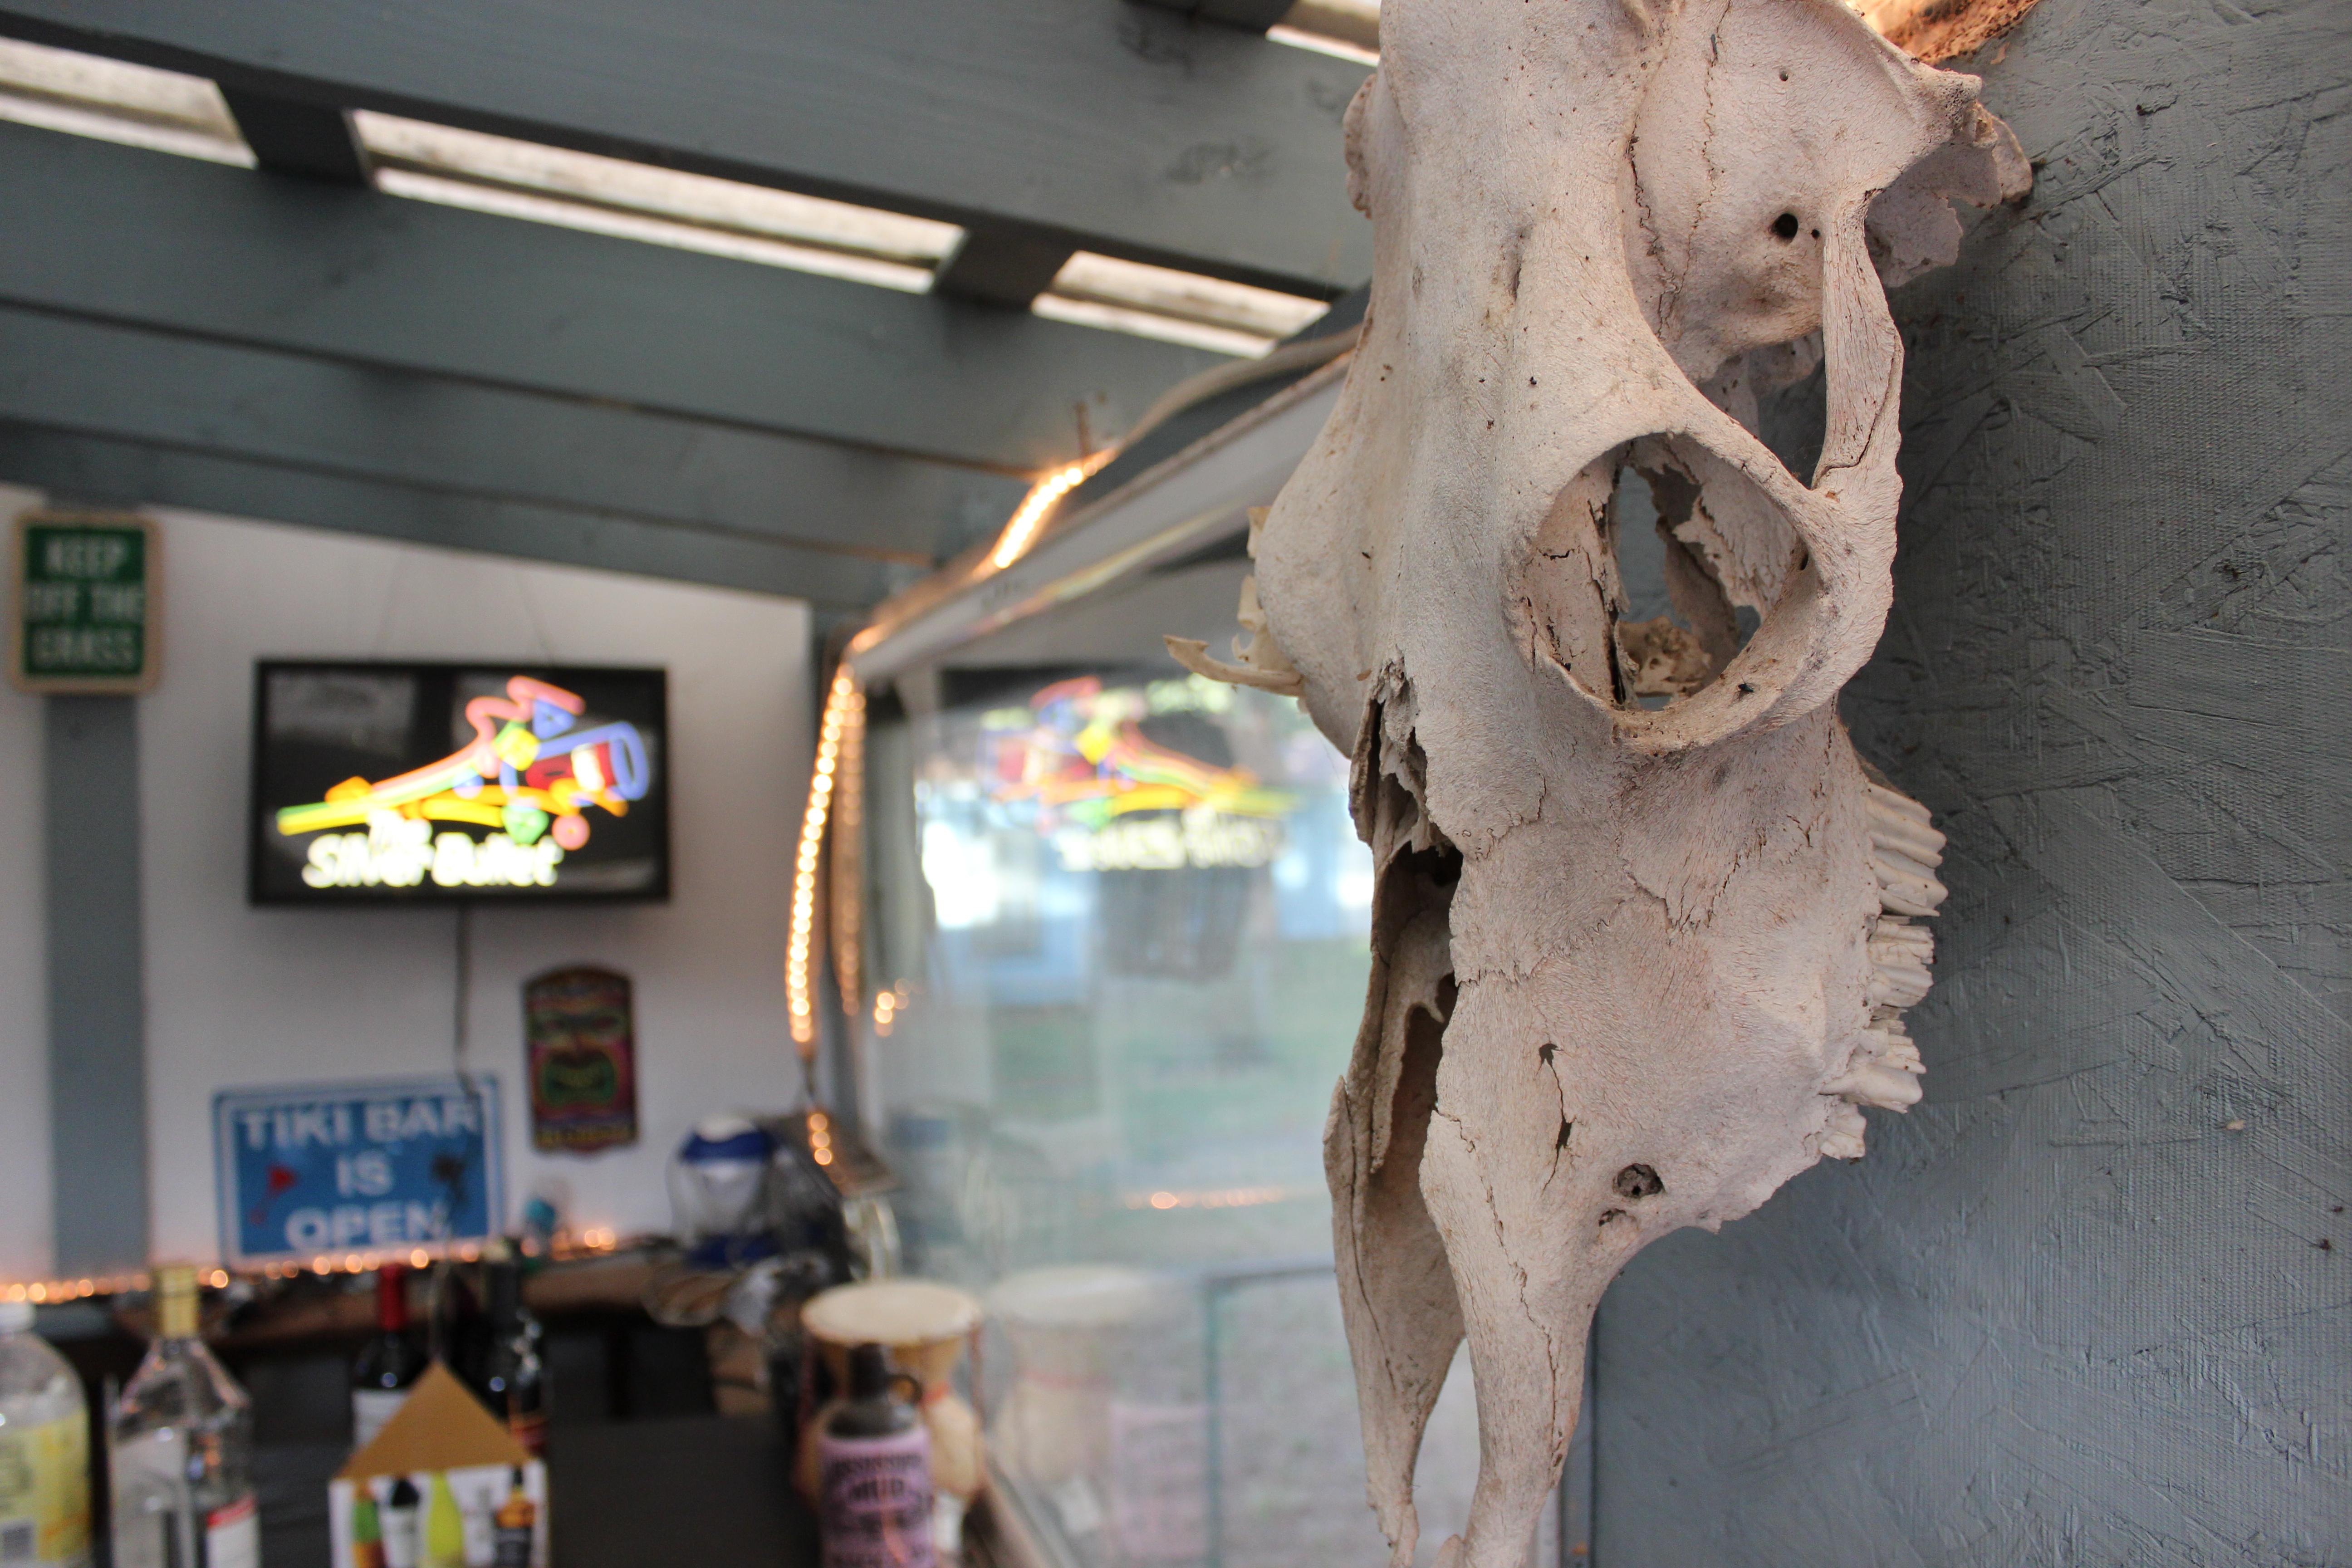 Photograph of an animal skull